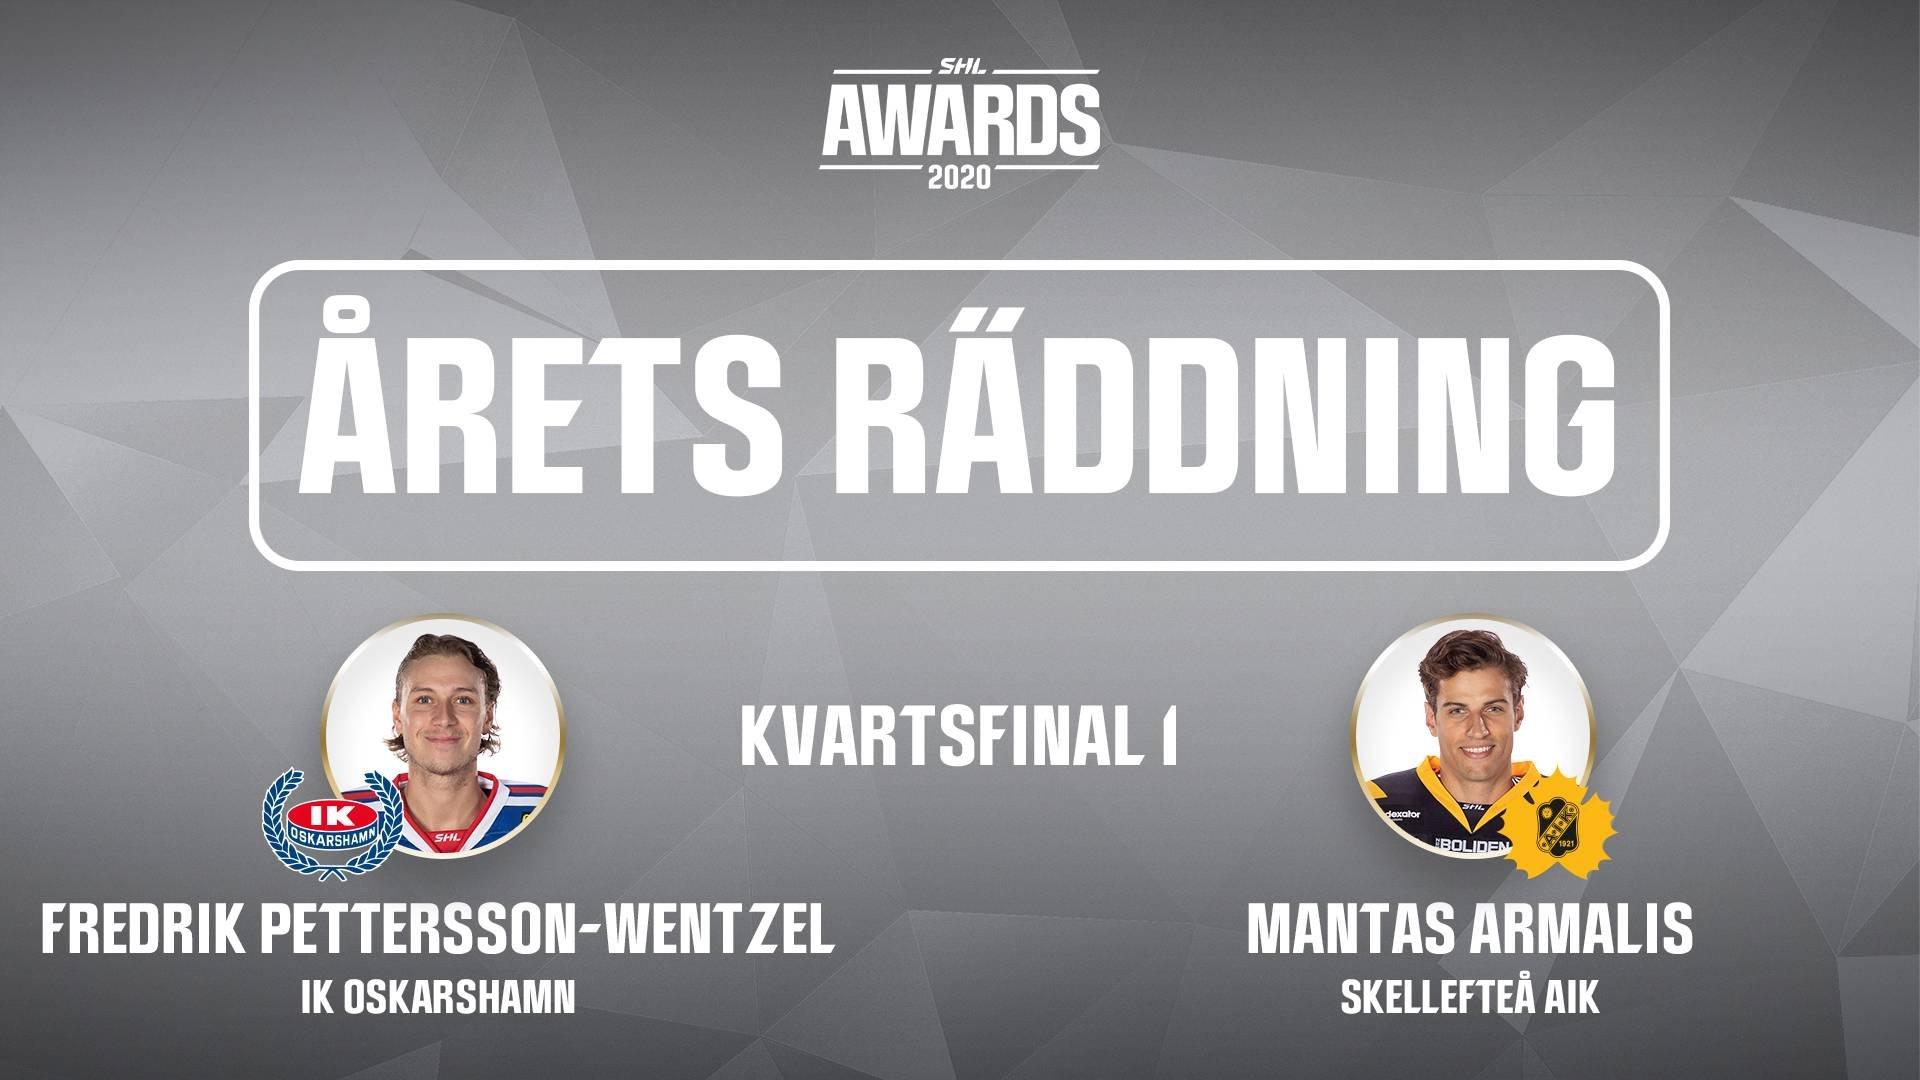 Årets räddning 2019/2020 - Kvartsfinal 1